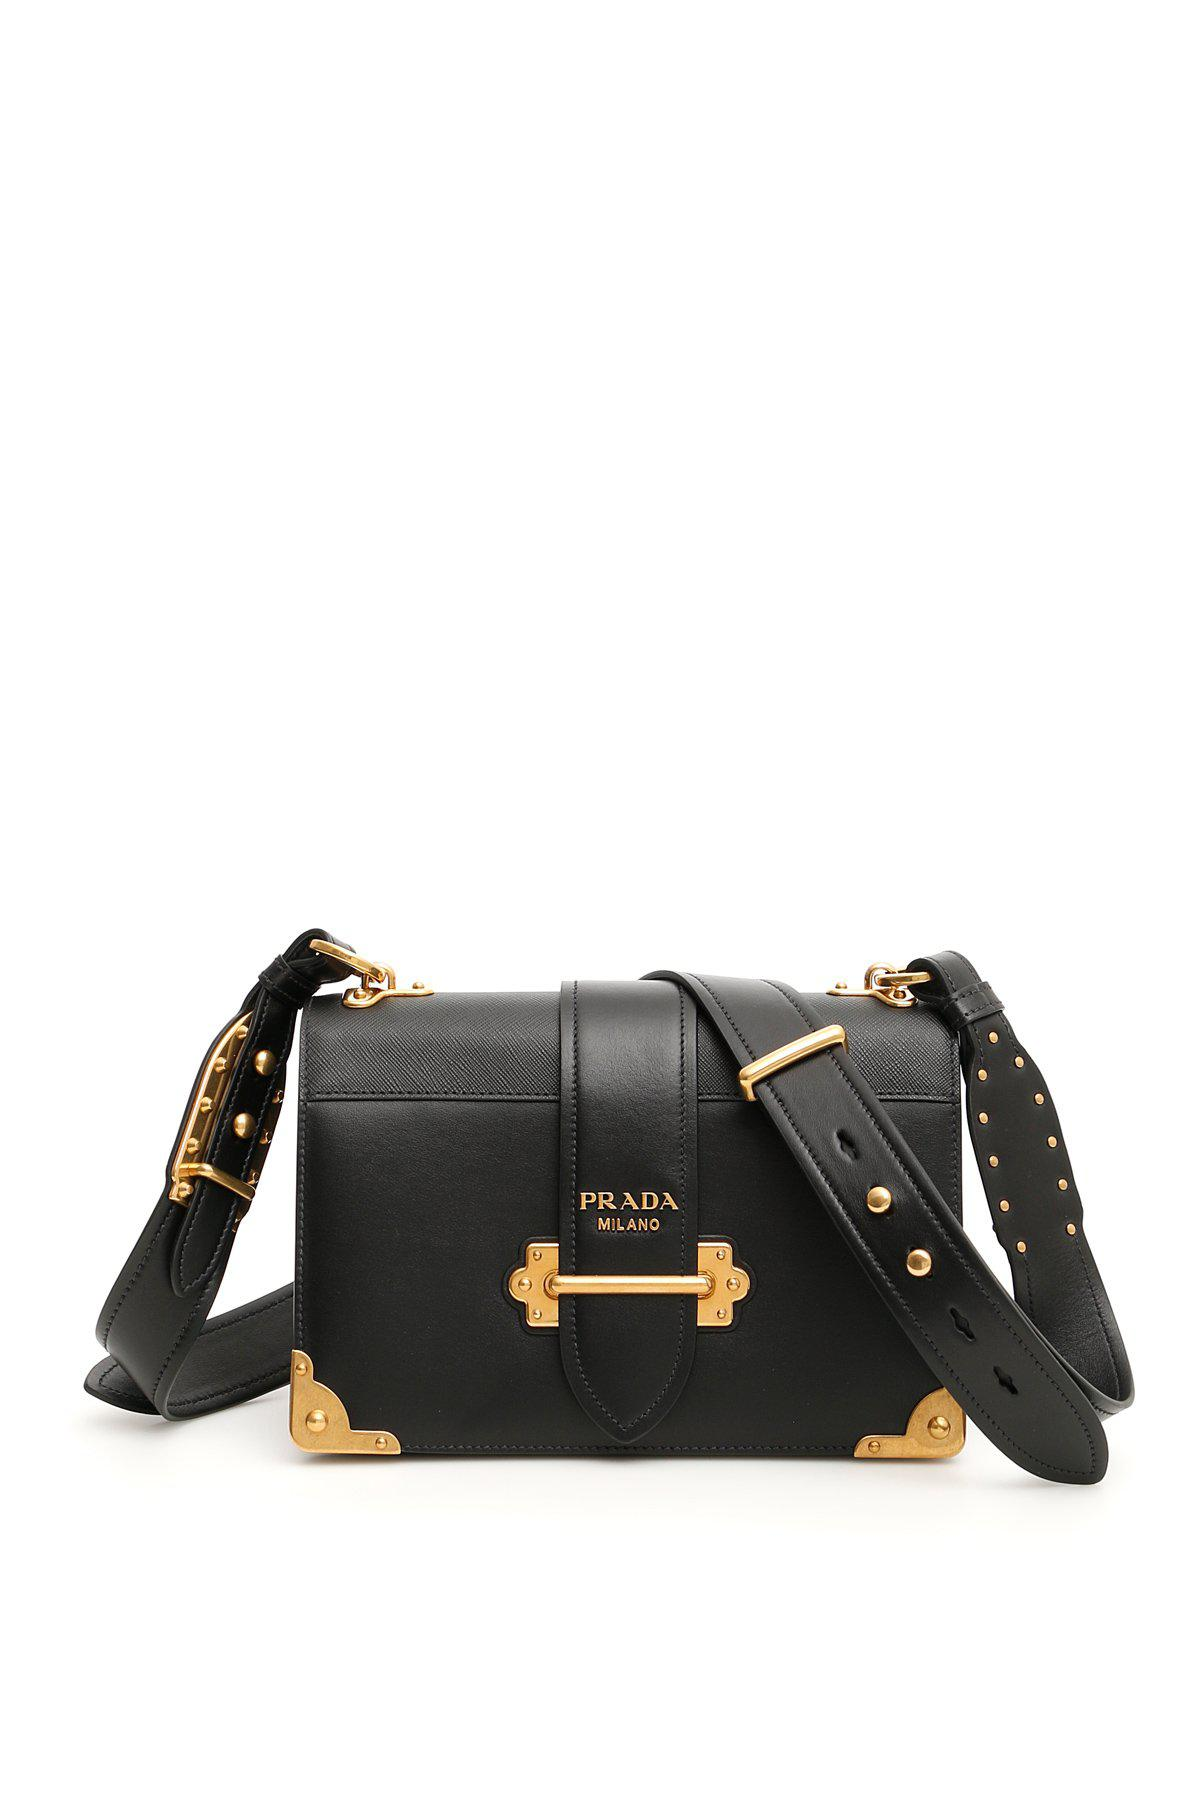 13871567acf5 Prada Logo Cahier Shoulder Bag in Black - Lyst